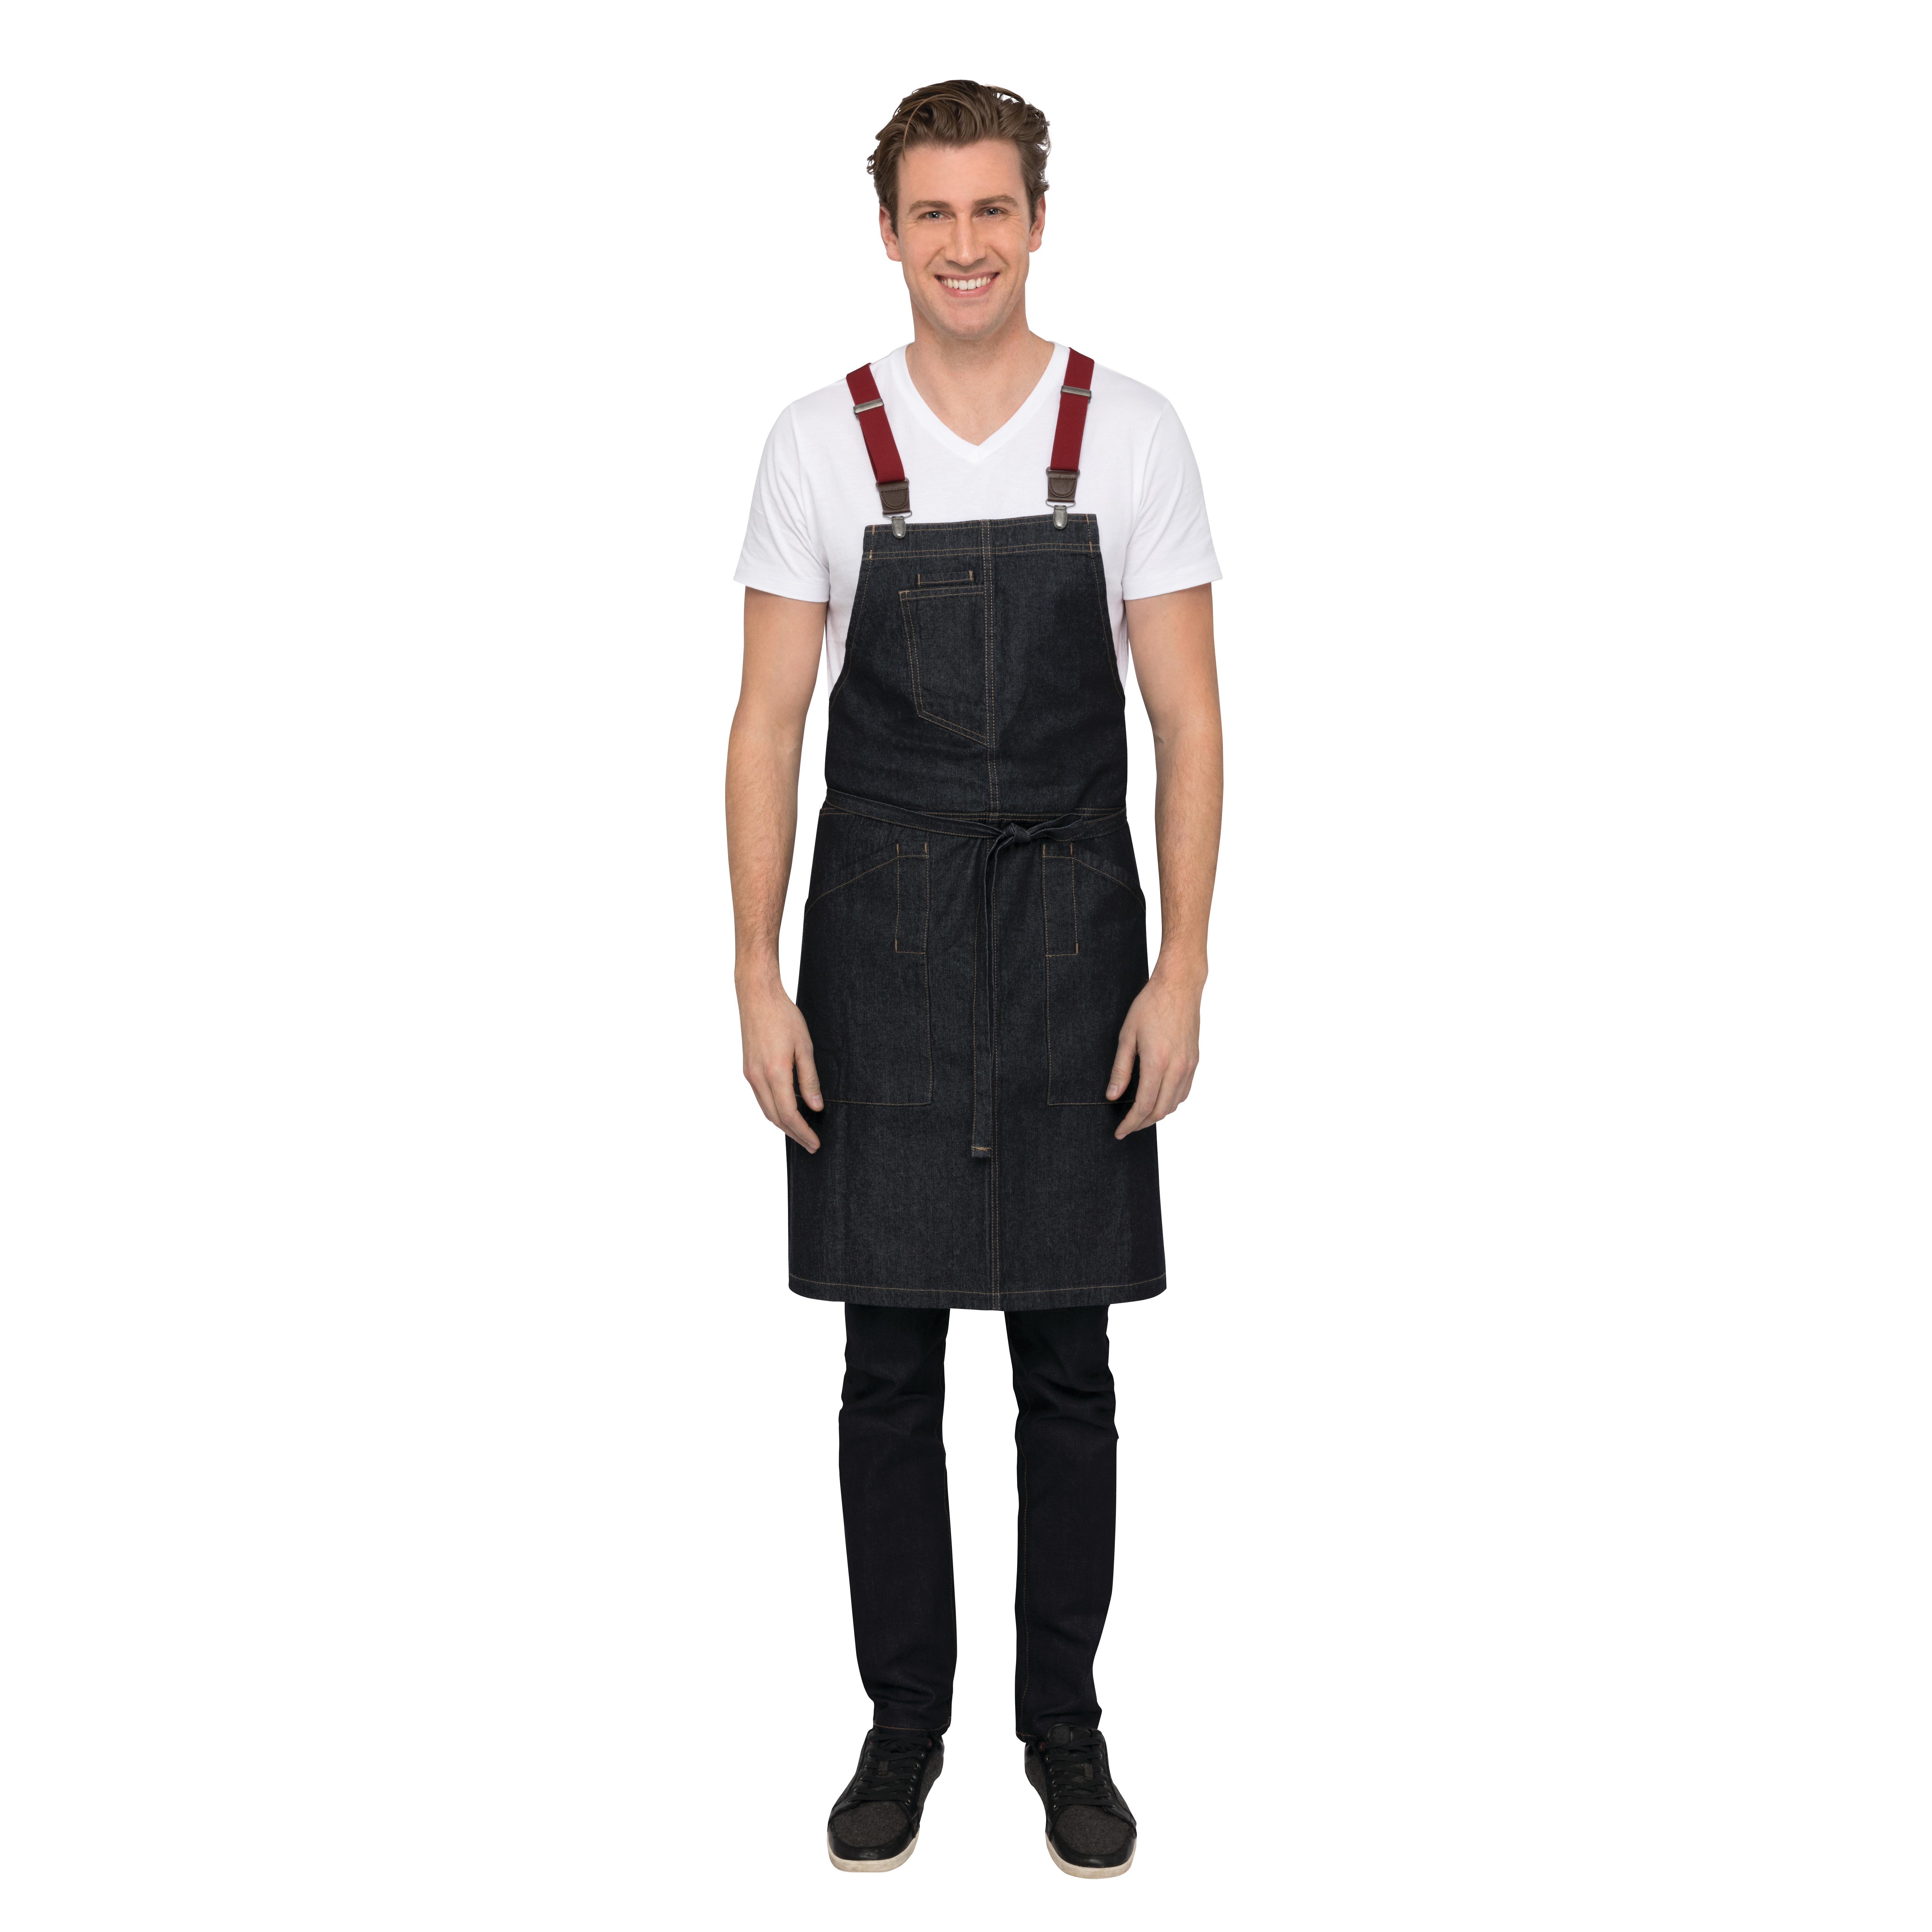 Chef Works ABS01IBL0 bib apron